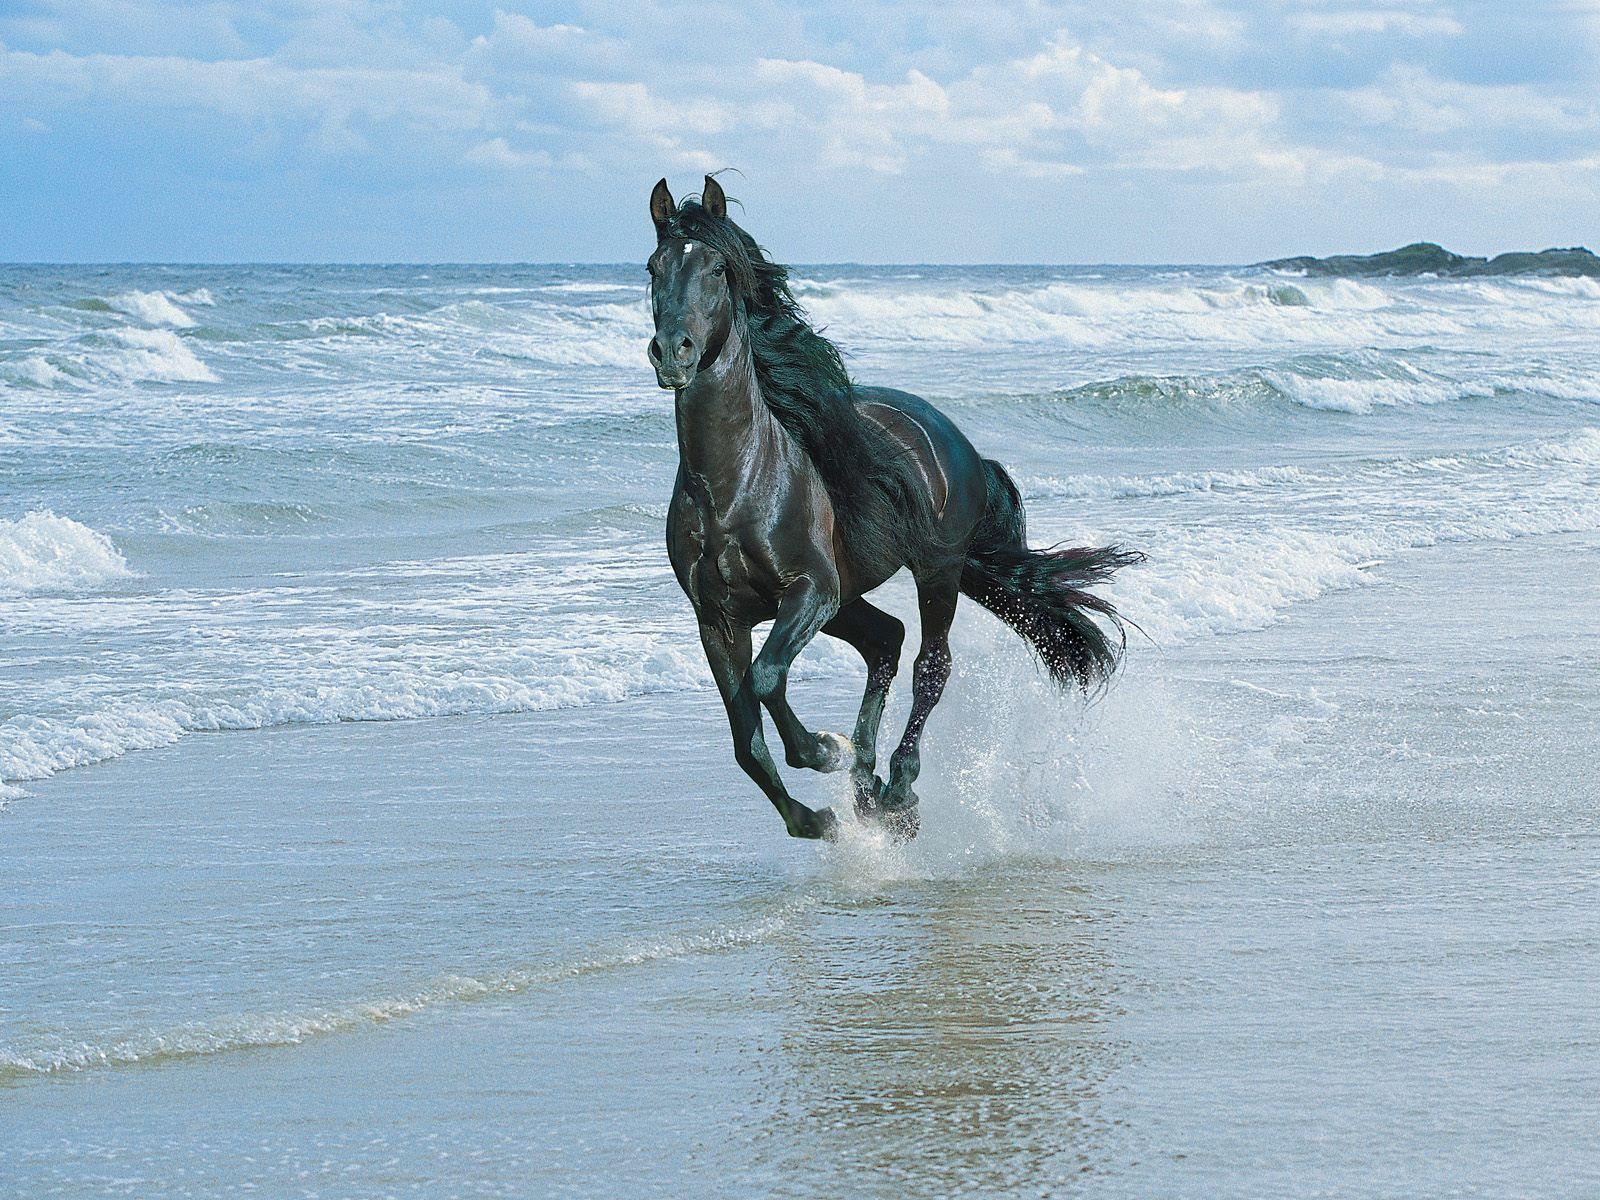 Simple Wallpaper Horse Beach - ed483cc011d50ccb71b9efec1d714145  Image_64145.jpg